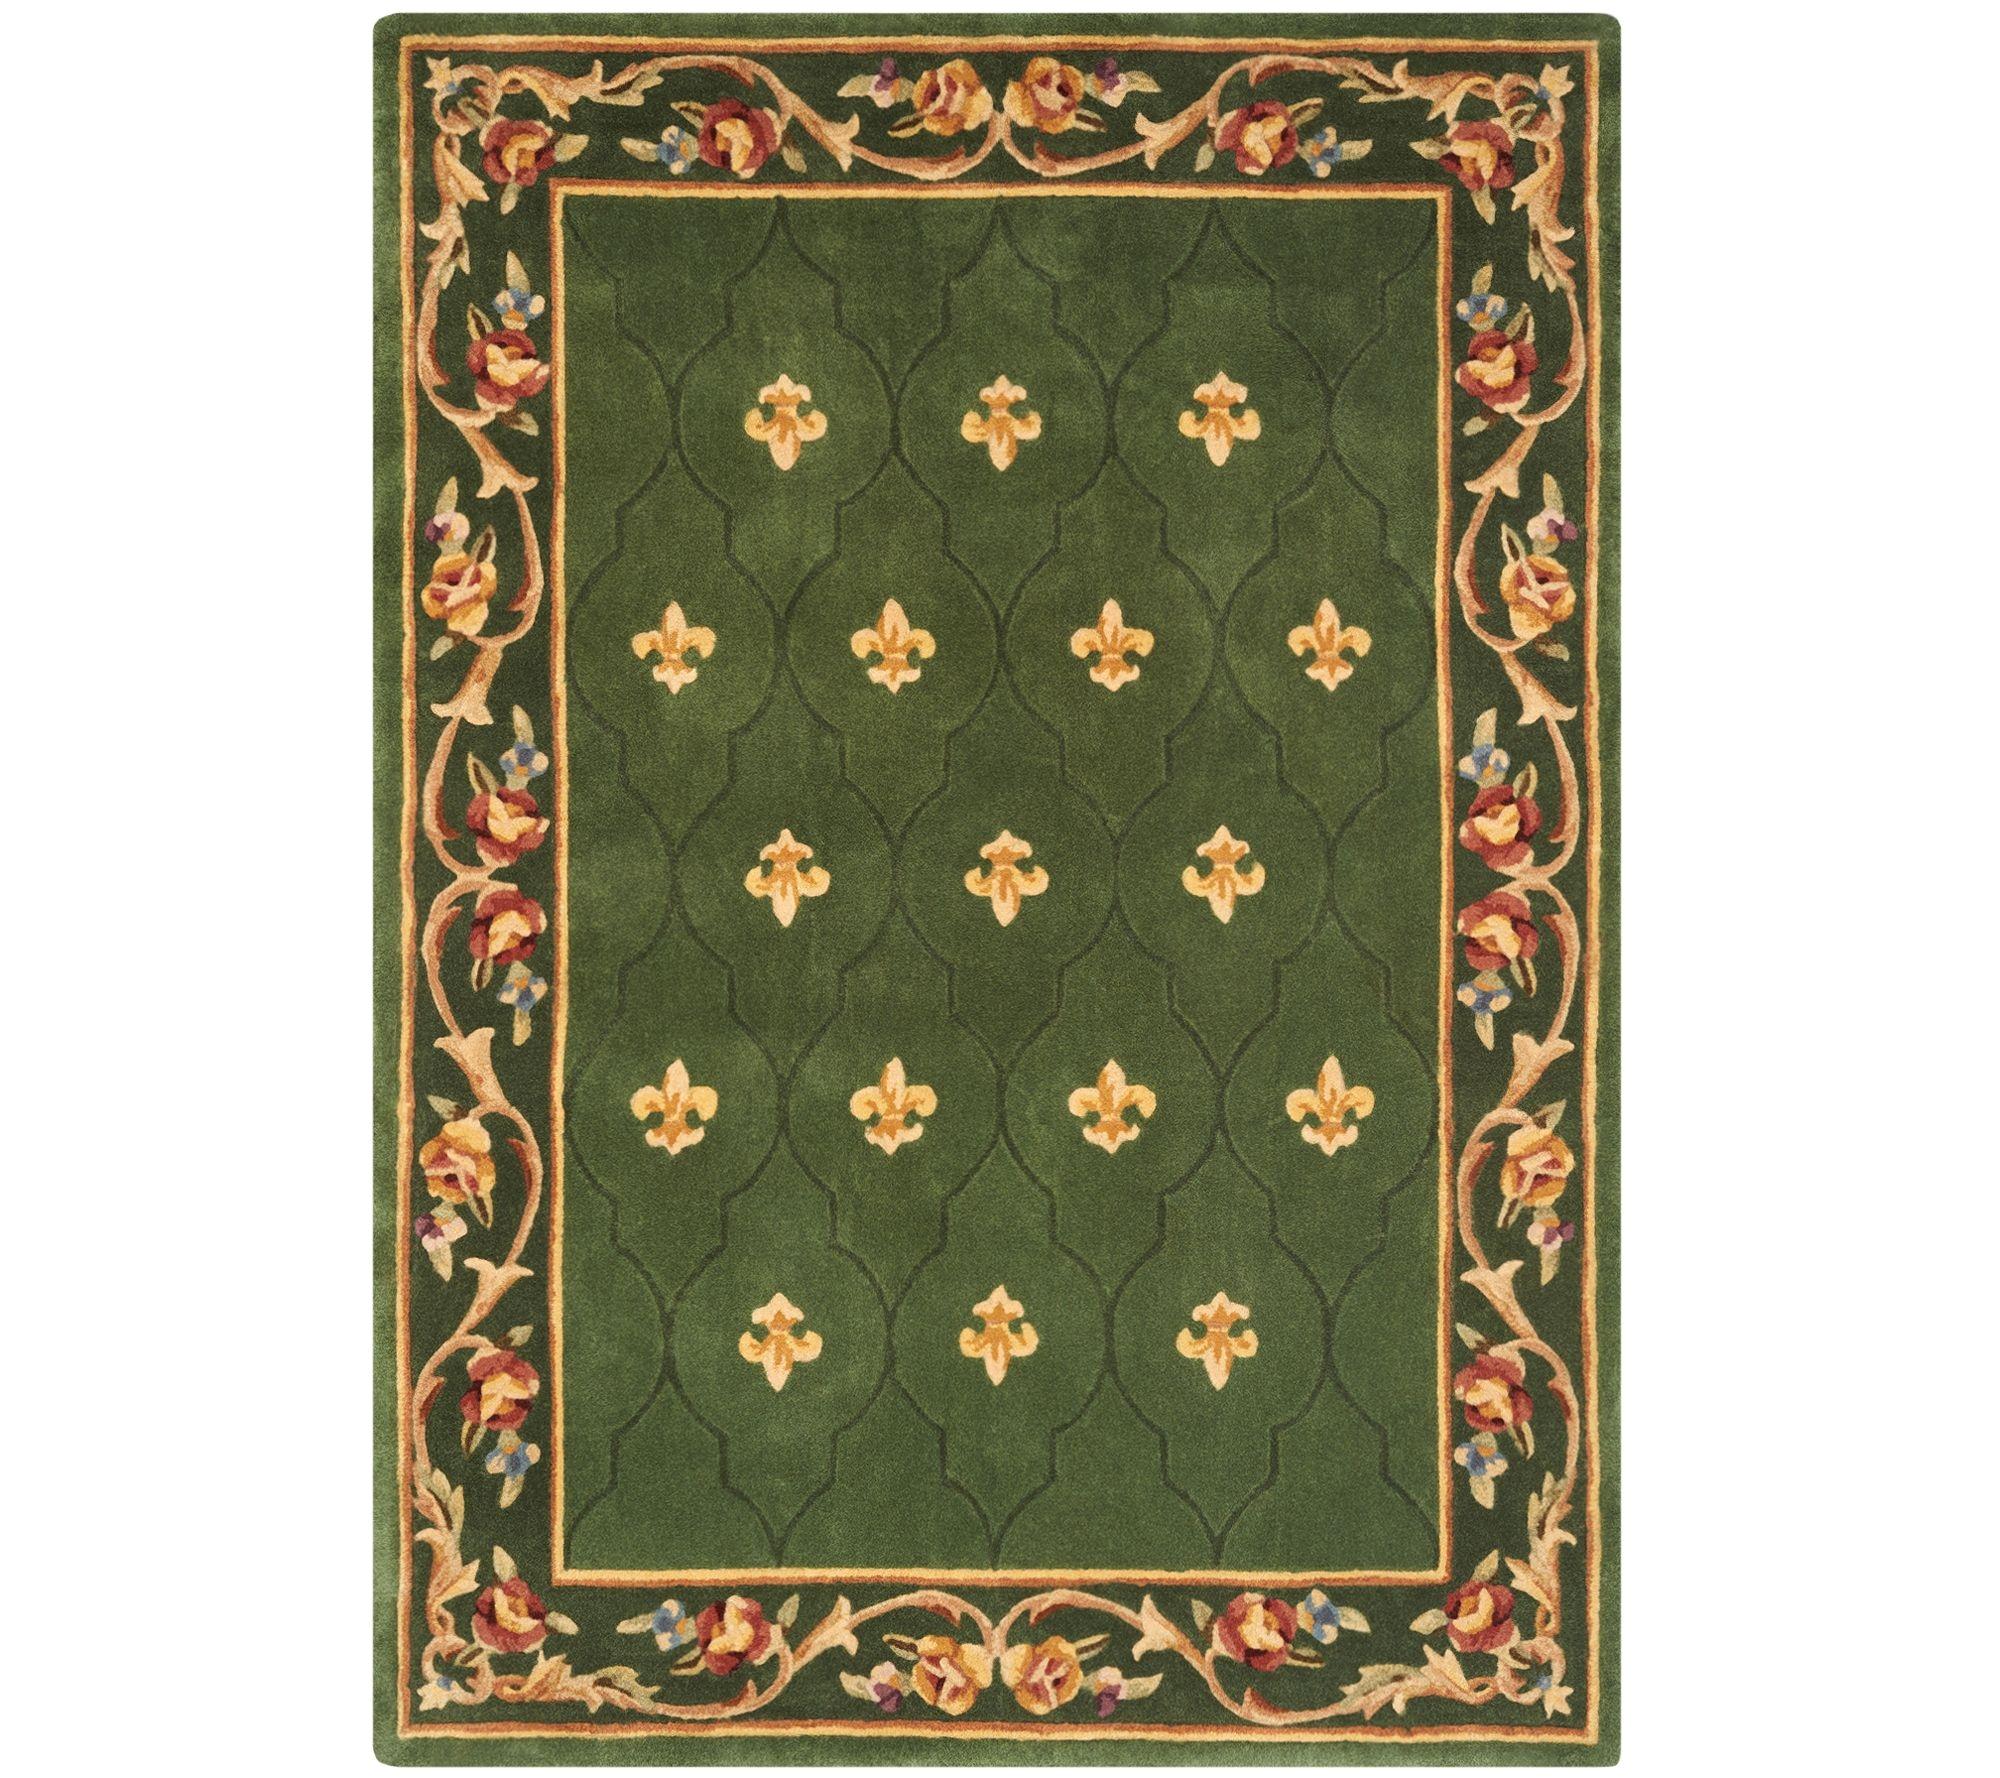 royal palace special edition 5 x7 fleur de lis wool rug page 1 qvc com